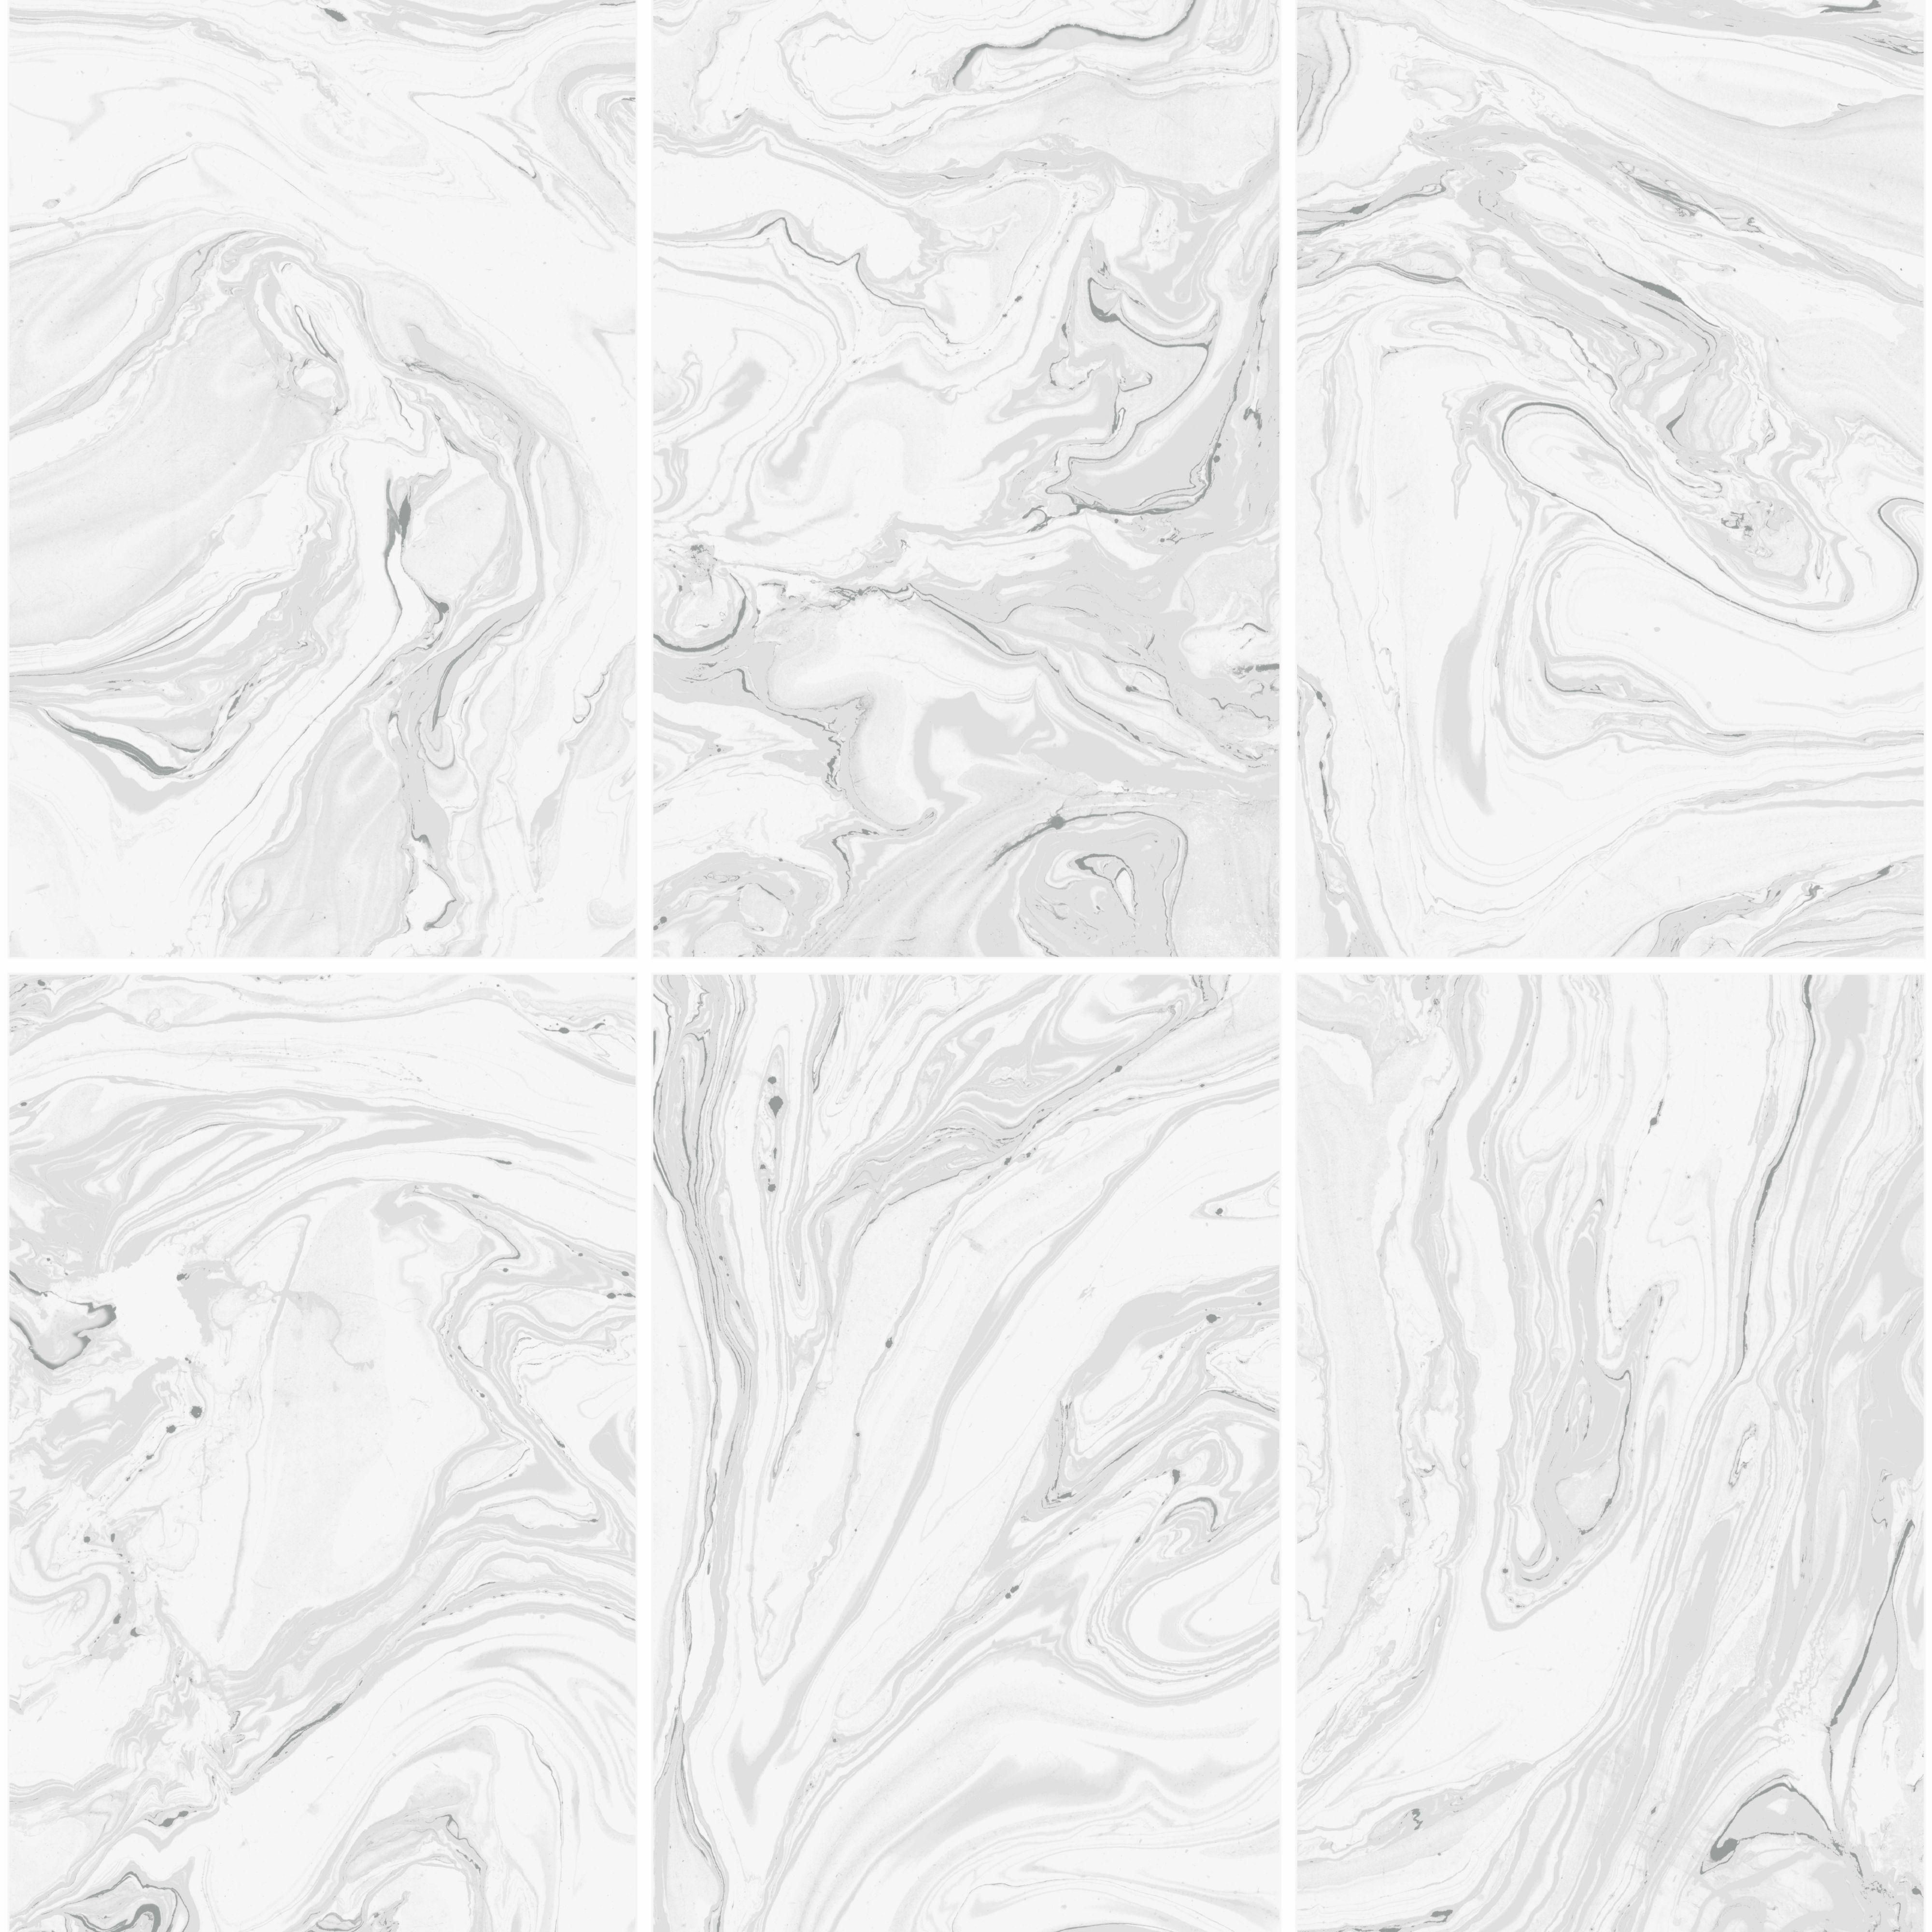 B q bathroom scales - Contour White Silver Glitter Marble Tile Glitter Kitchen Bathroom Wallpaper Departments Diy